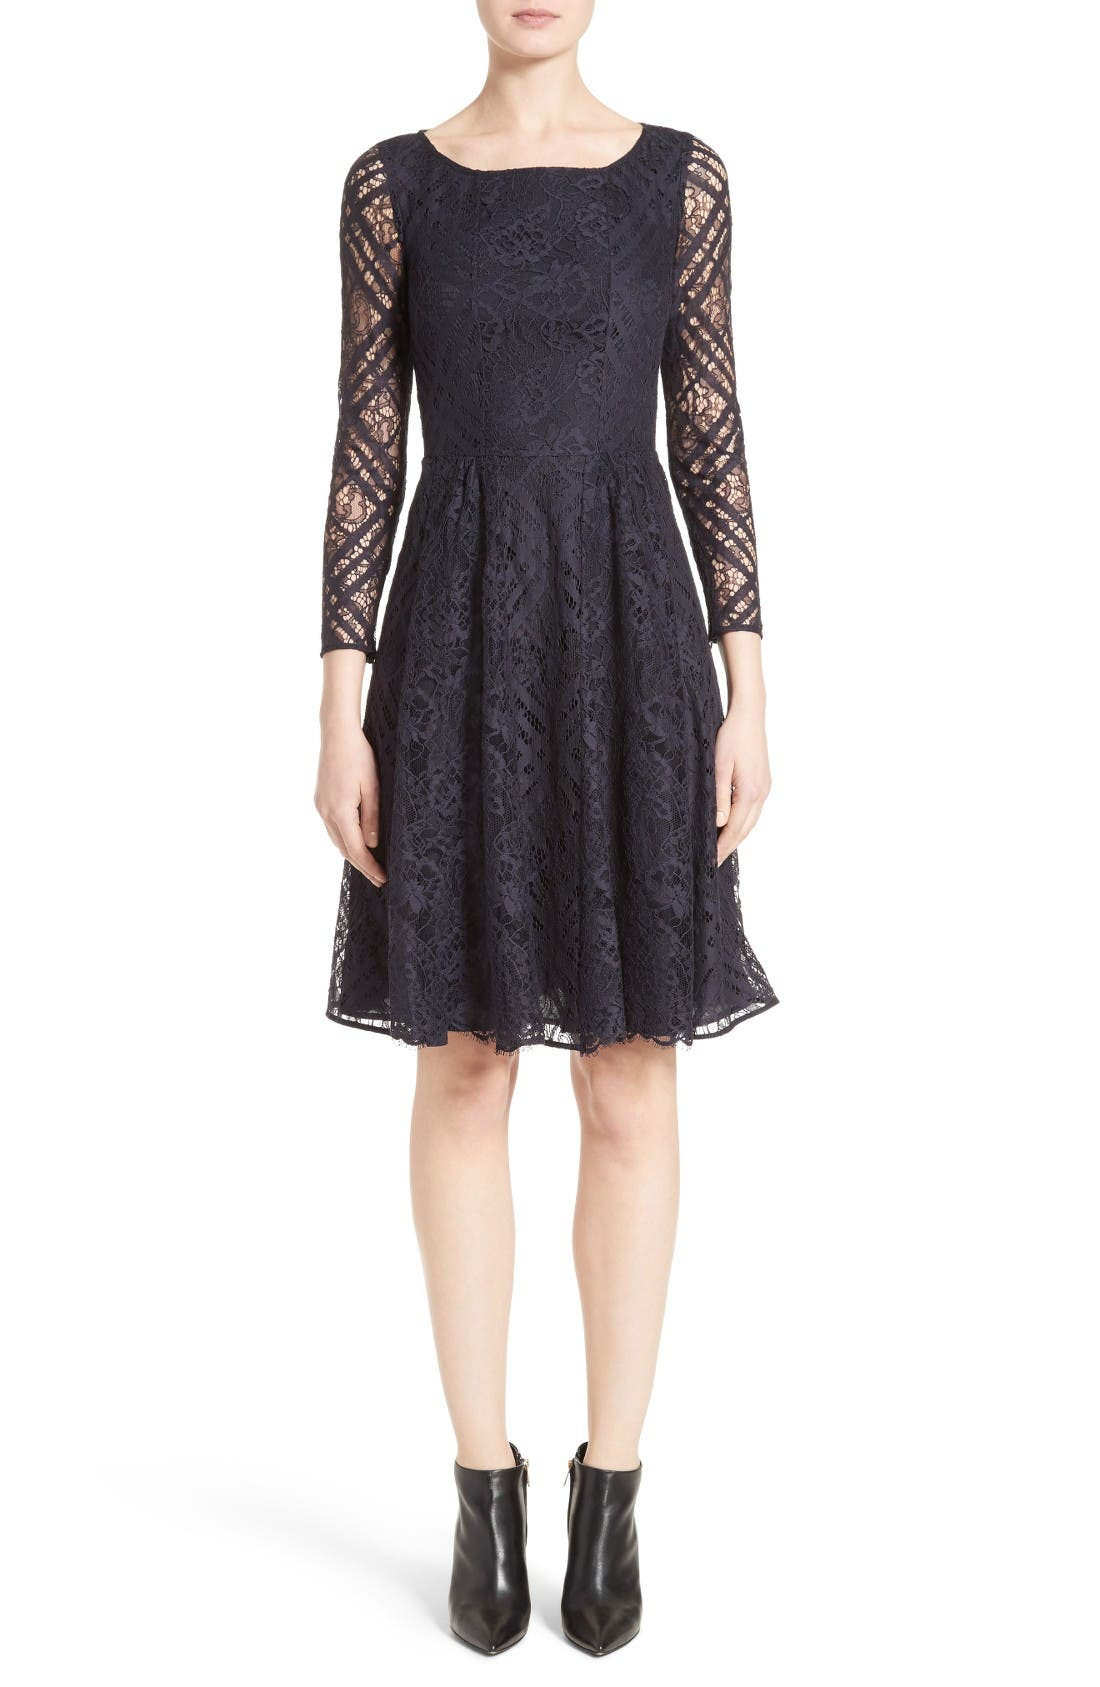 Main Image - Burberry Liliana Lace Fit & Flare Dress